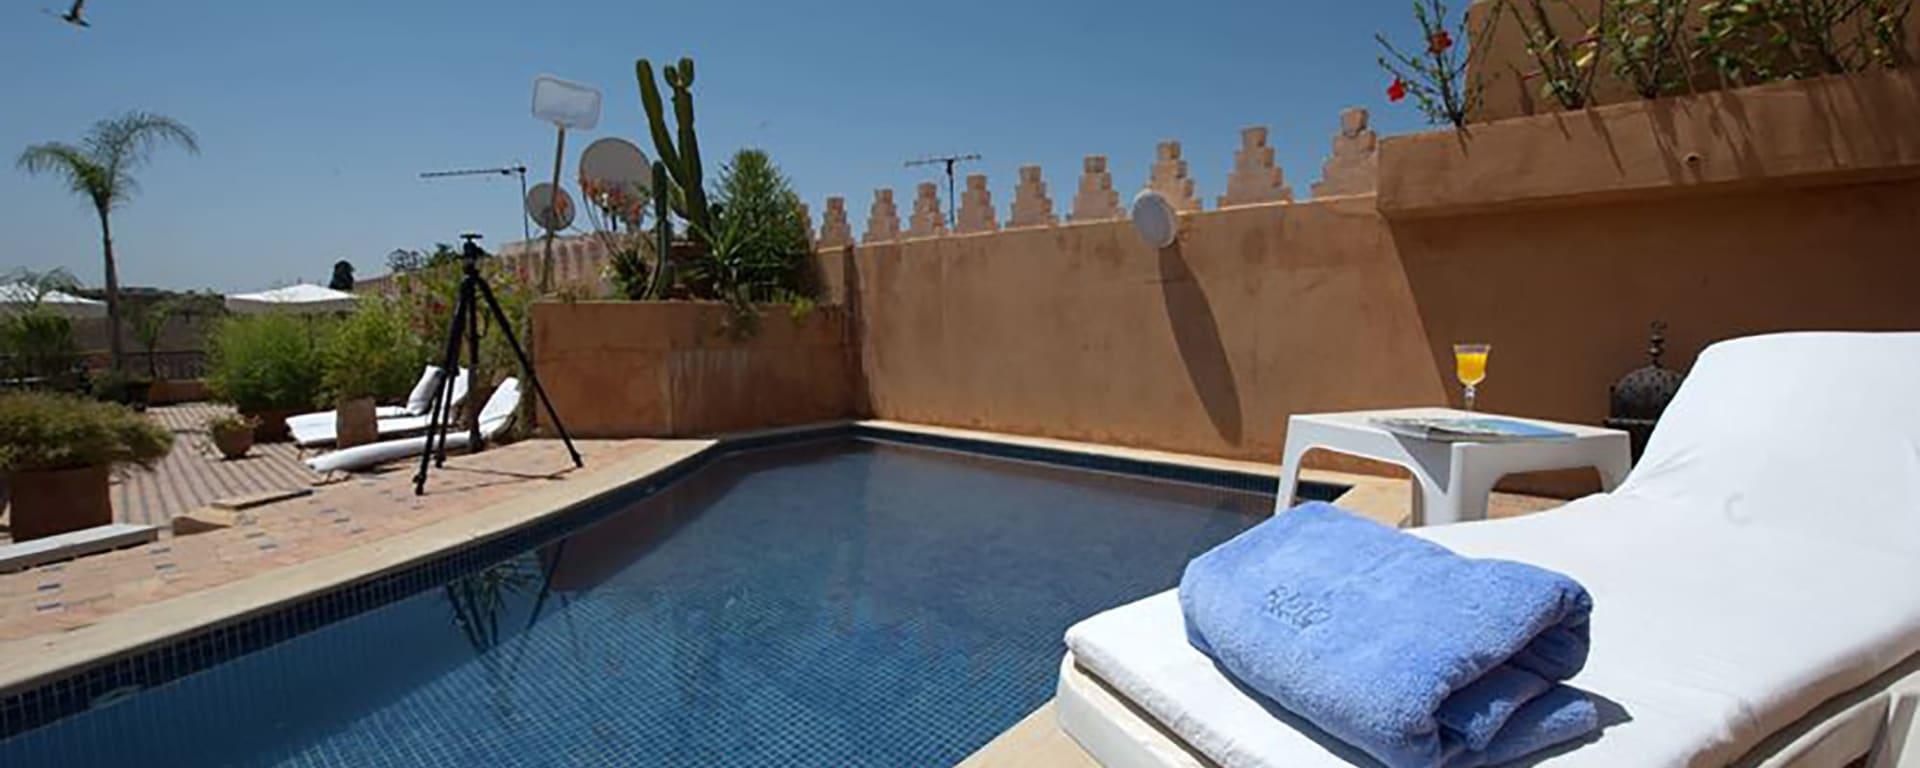 Riad Yacout in Meknès: Marokko Riad Yacout Pool